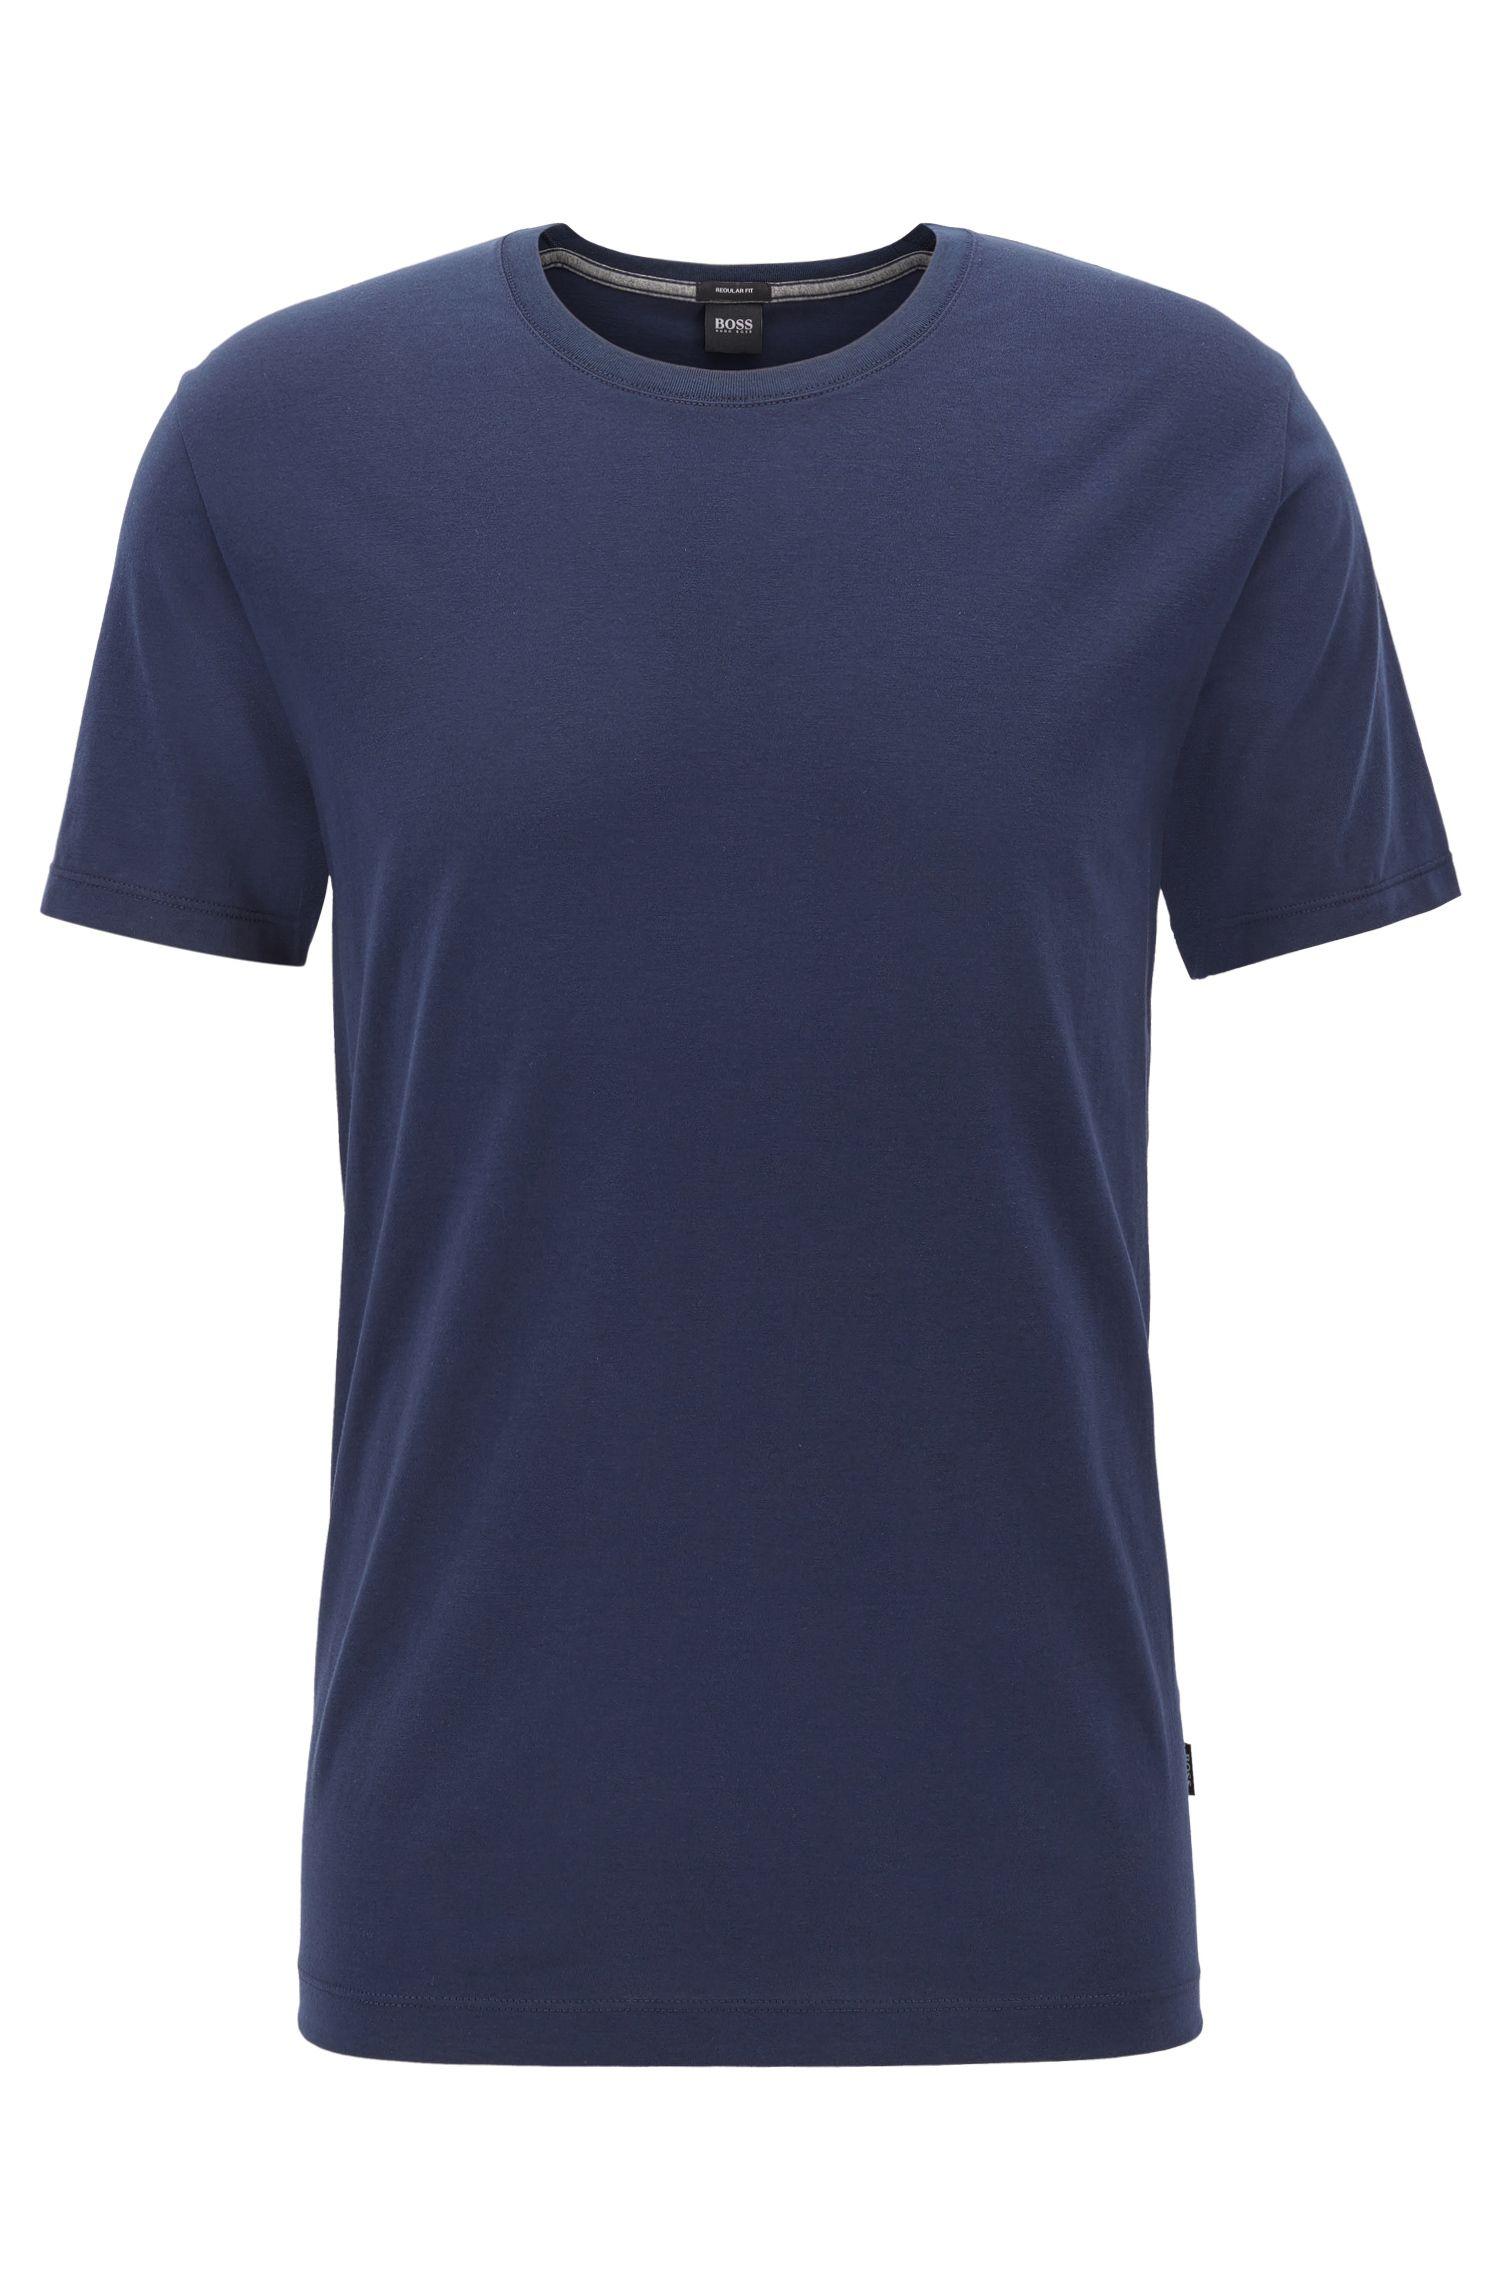 Regular-fit T-shirt in soft cotton